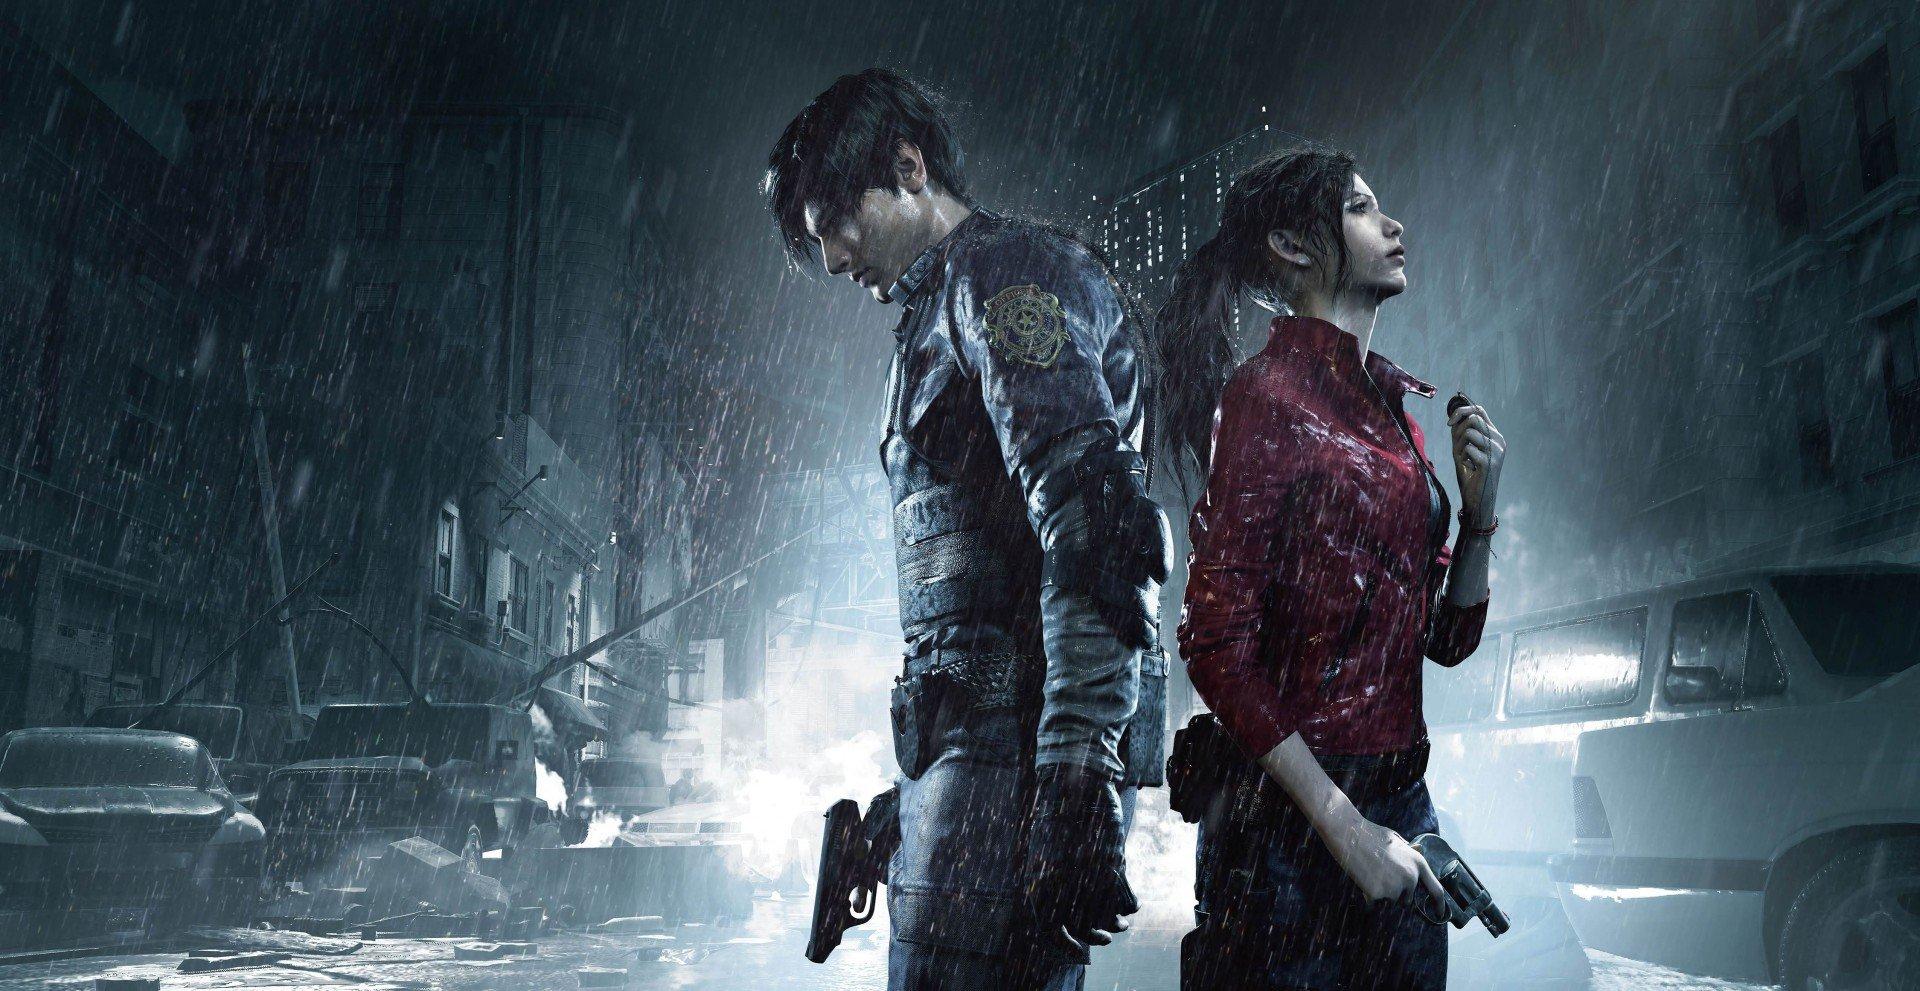 В Steam началась распродажа серии Resident Evil скидки до 87